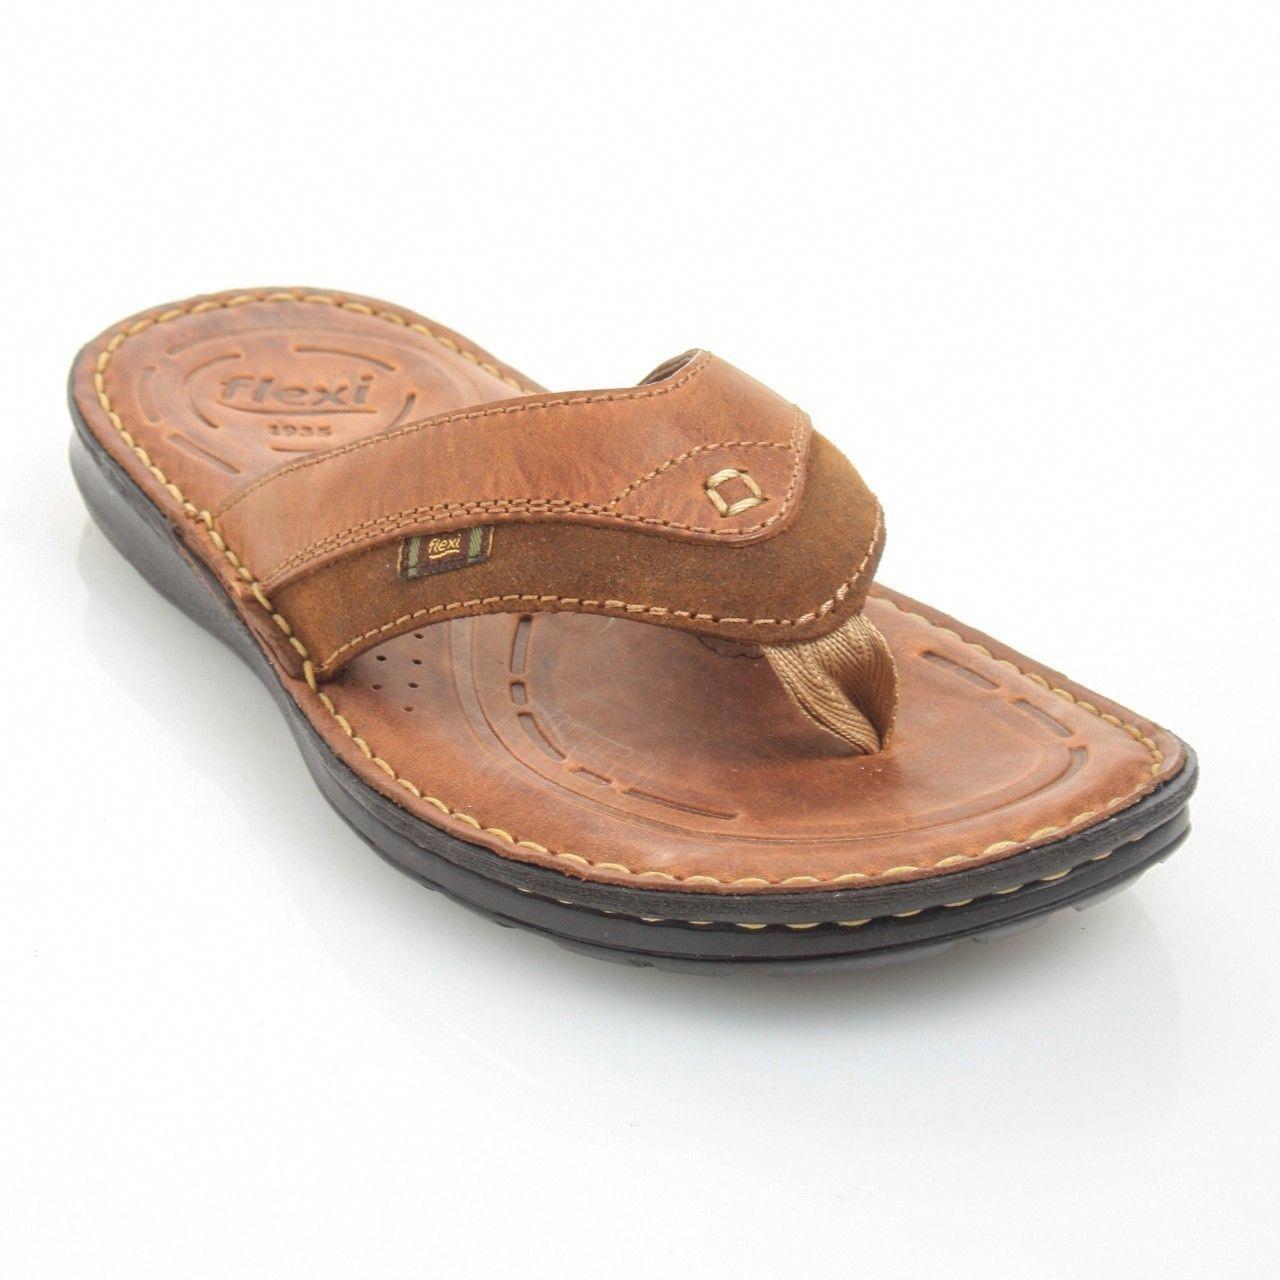 d47624aa6a9e8 Amazon Women S Shoes Clearance #RykaWomenSShoesReview ...